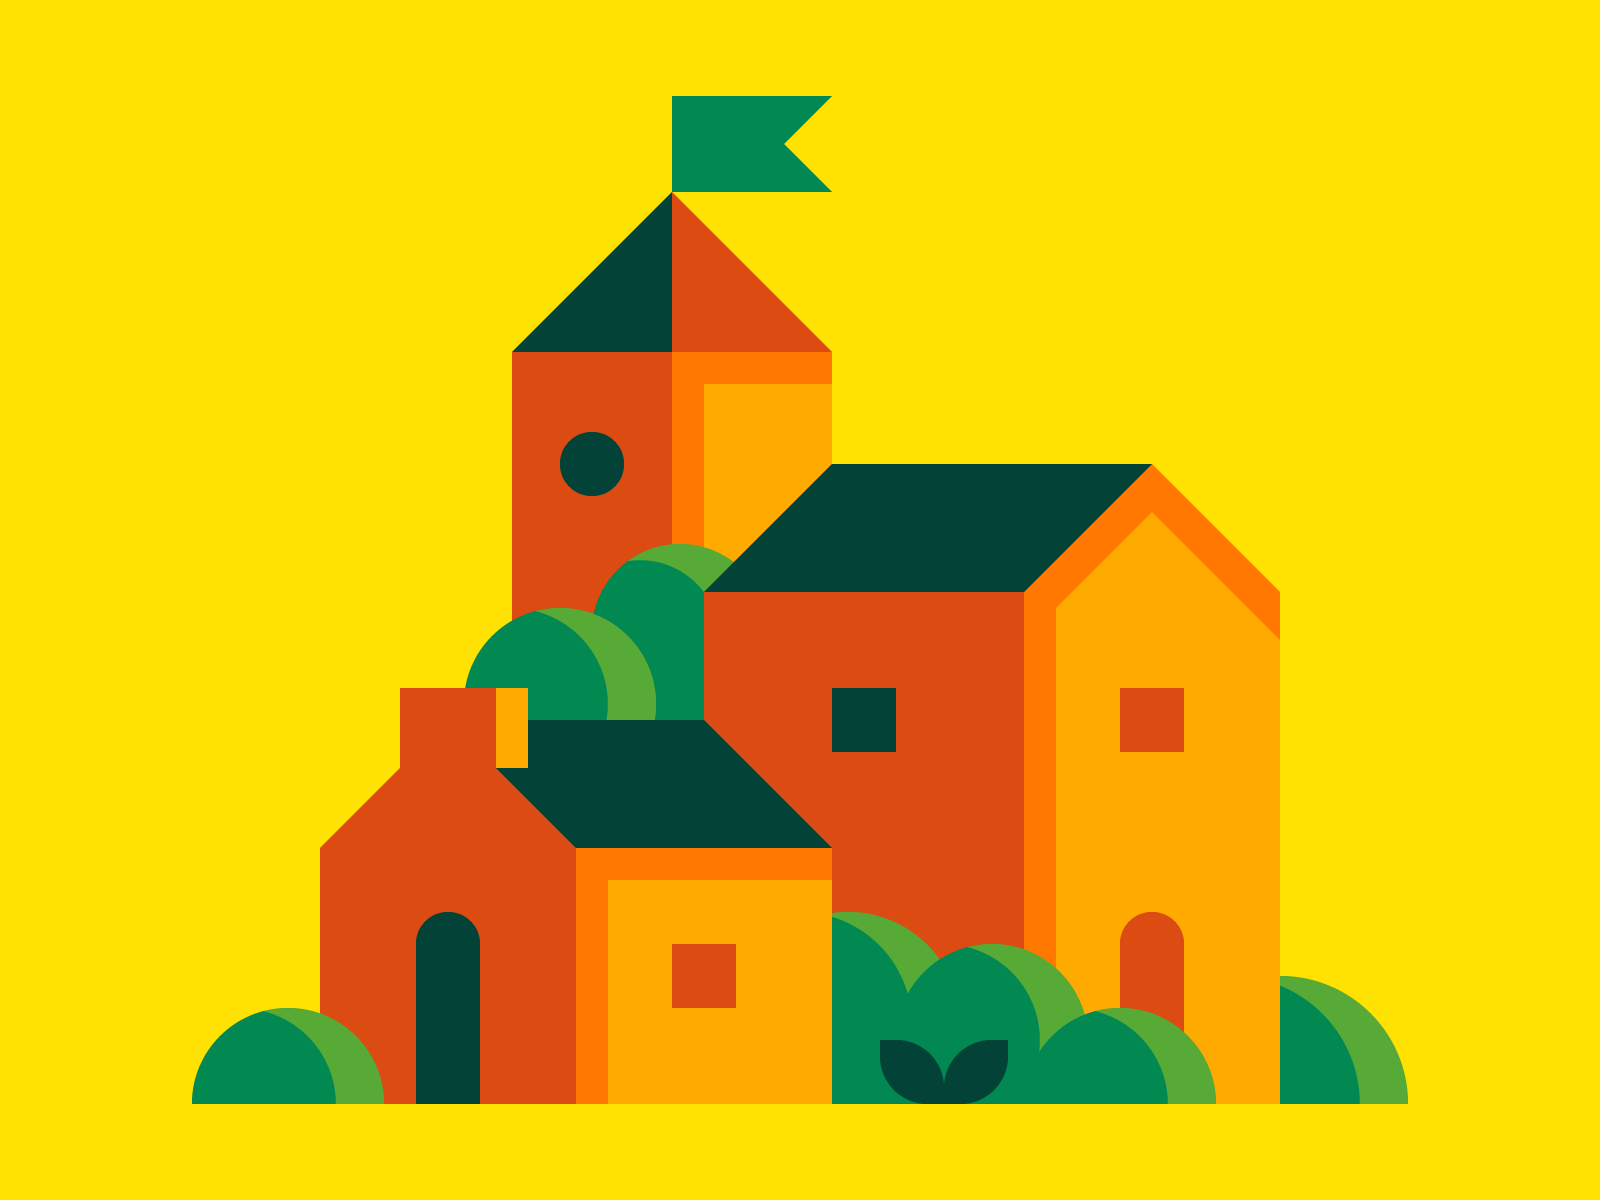 Little Town illustration and design by Alex Pasquarella